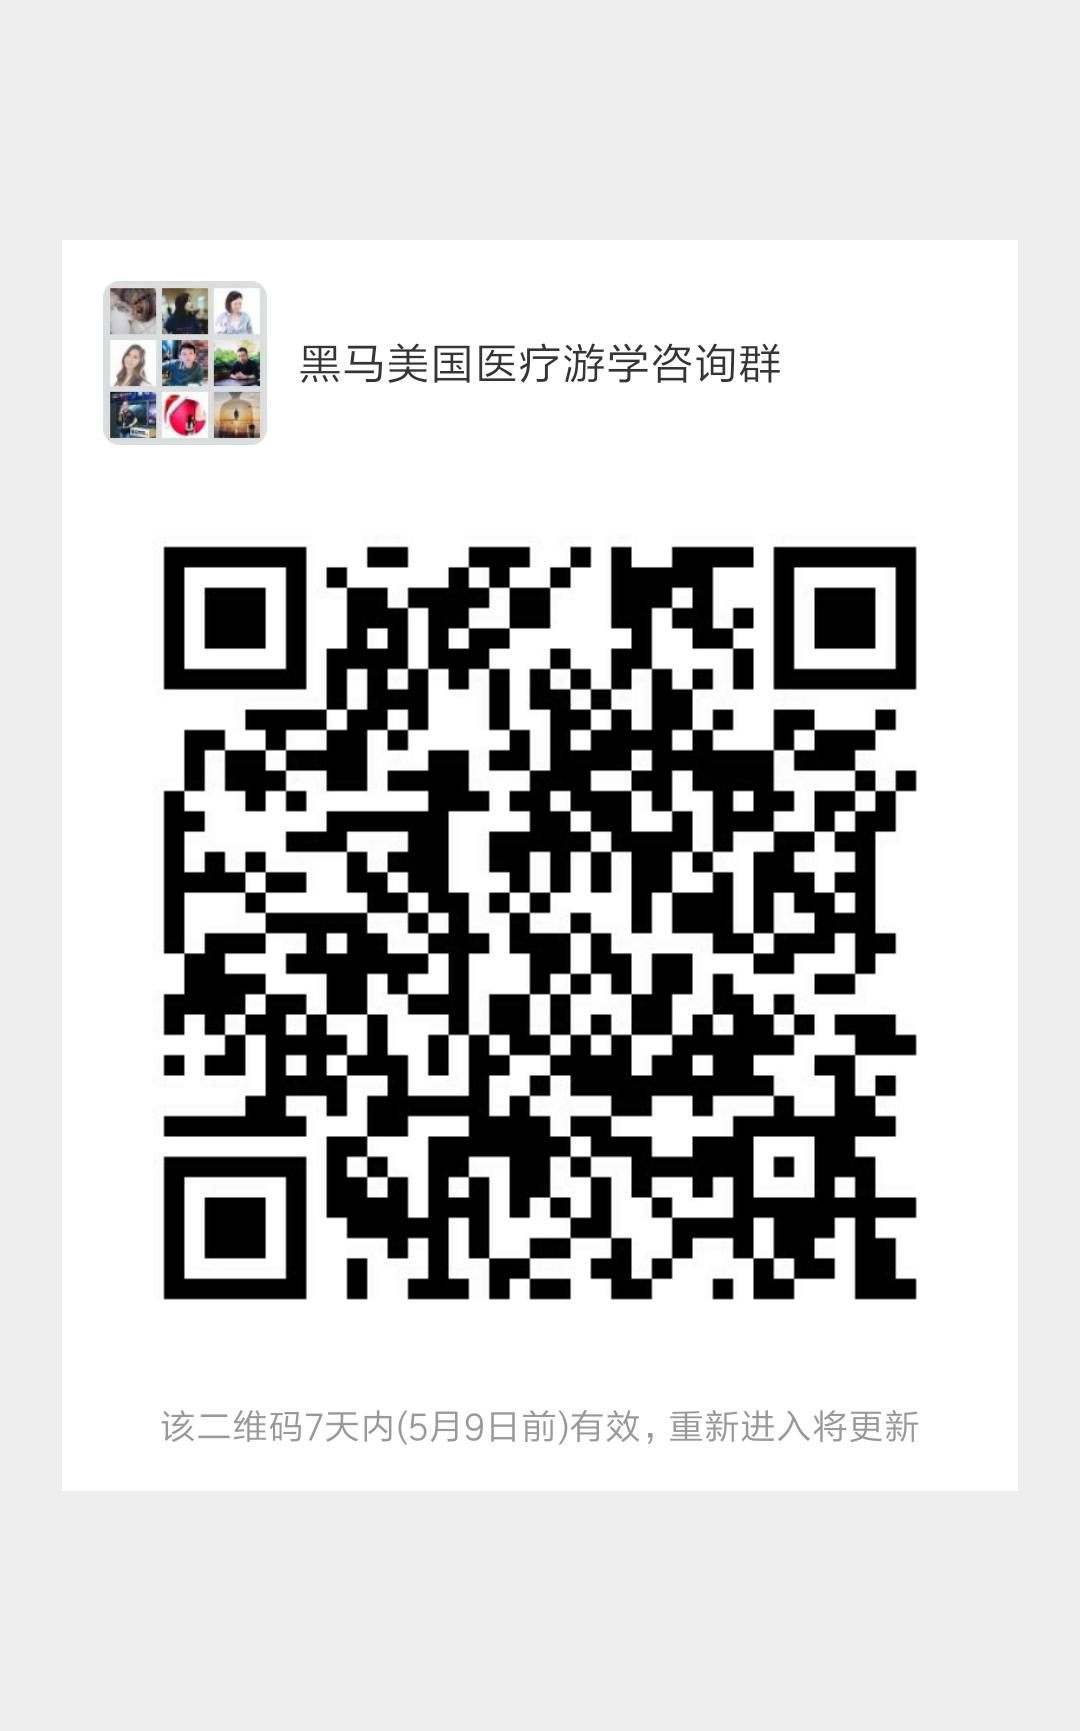 WechatIMG4203.png